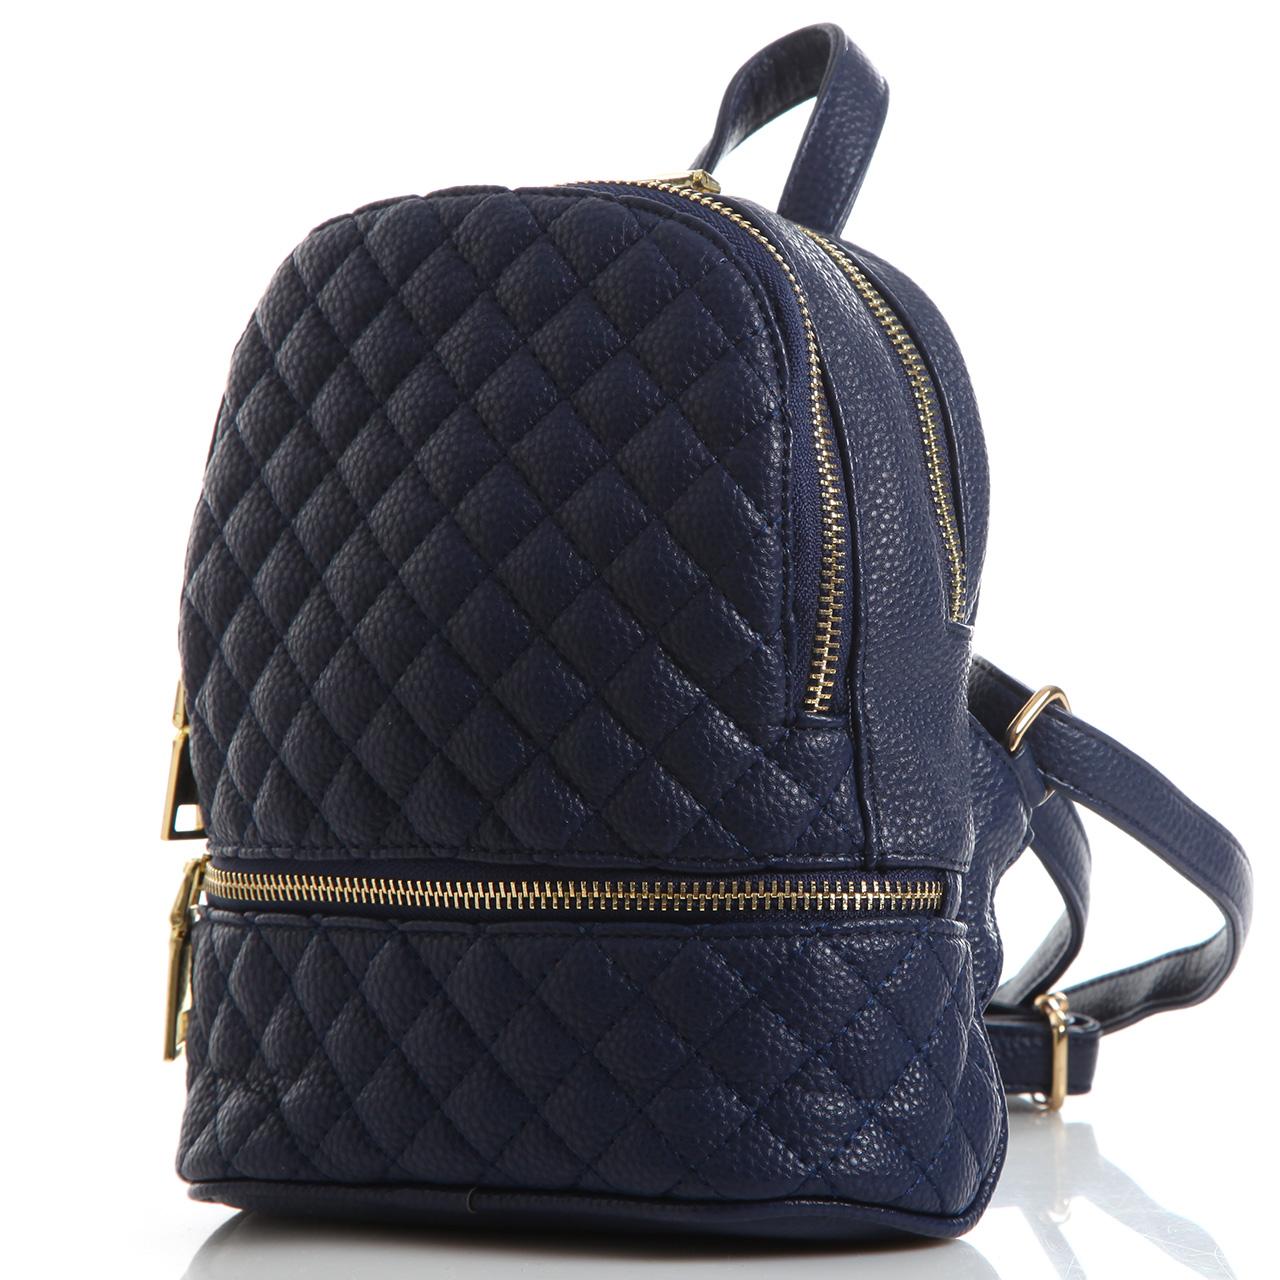 43ae97d6960c Рюкзаки купить в интернет-магазине Домани (Domani)